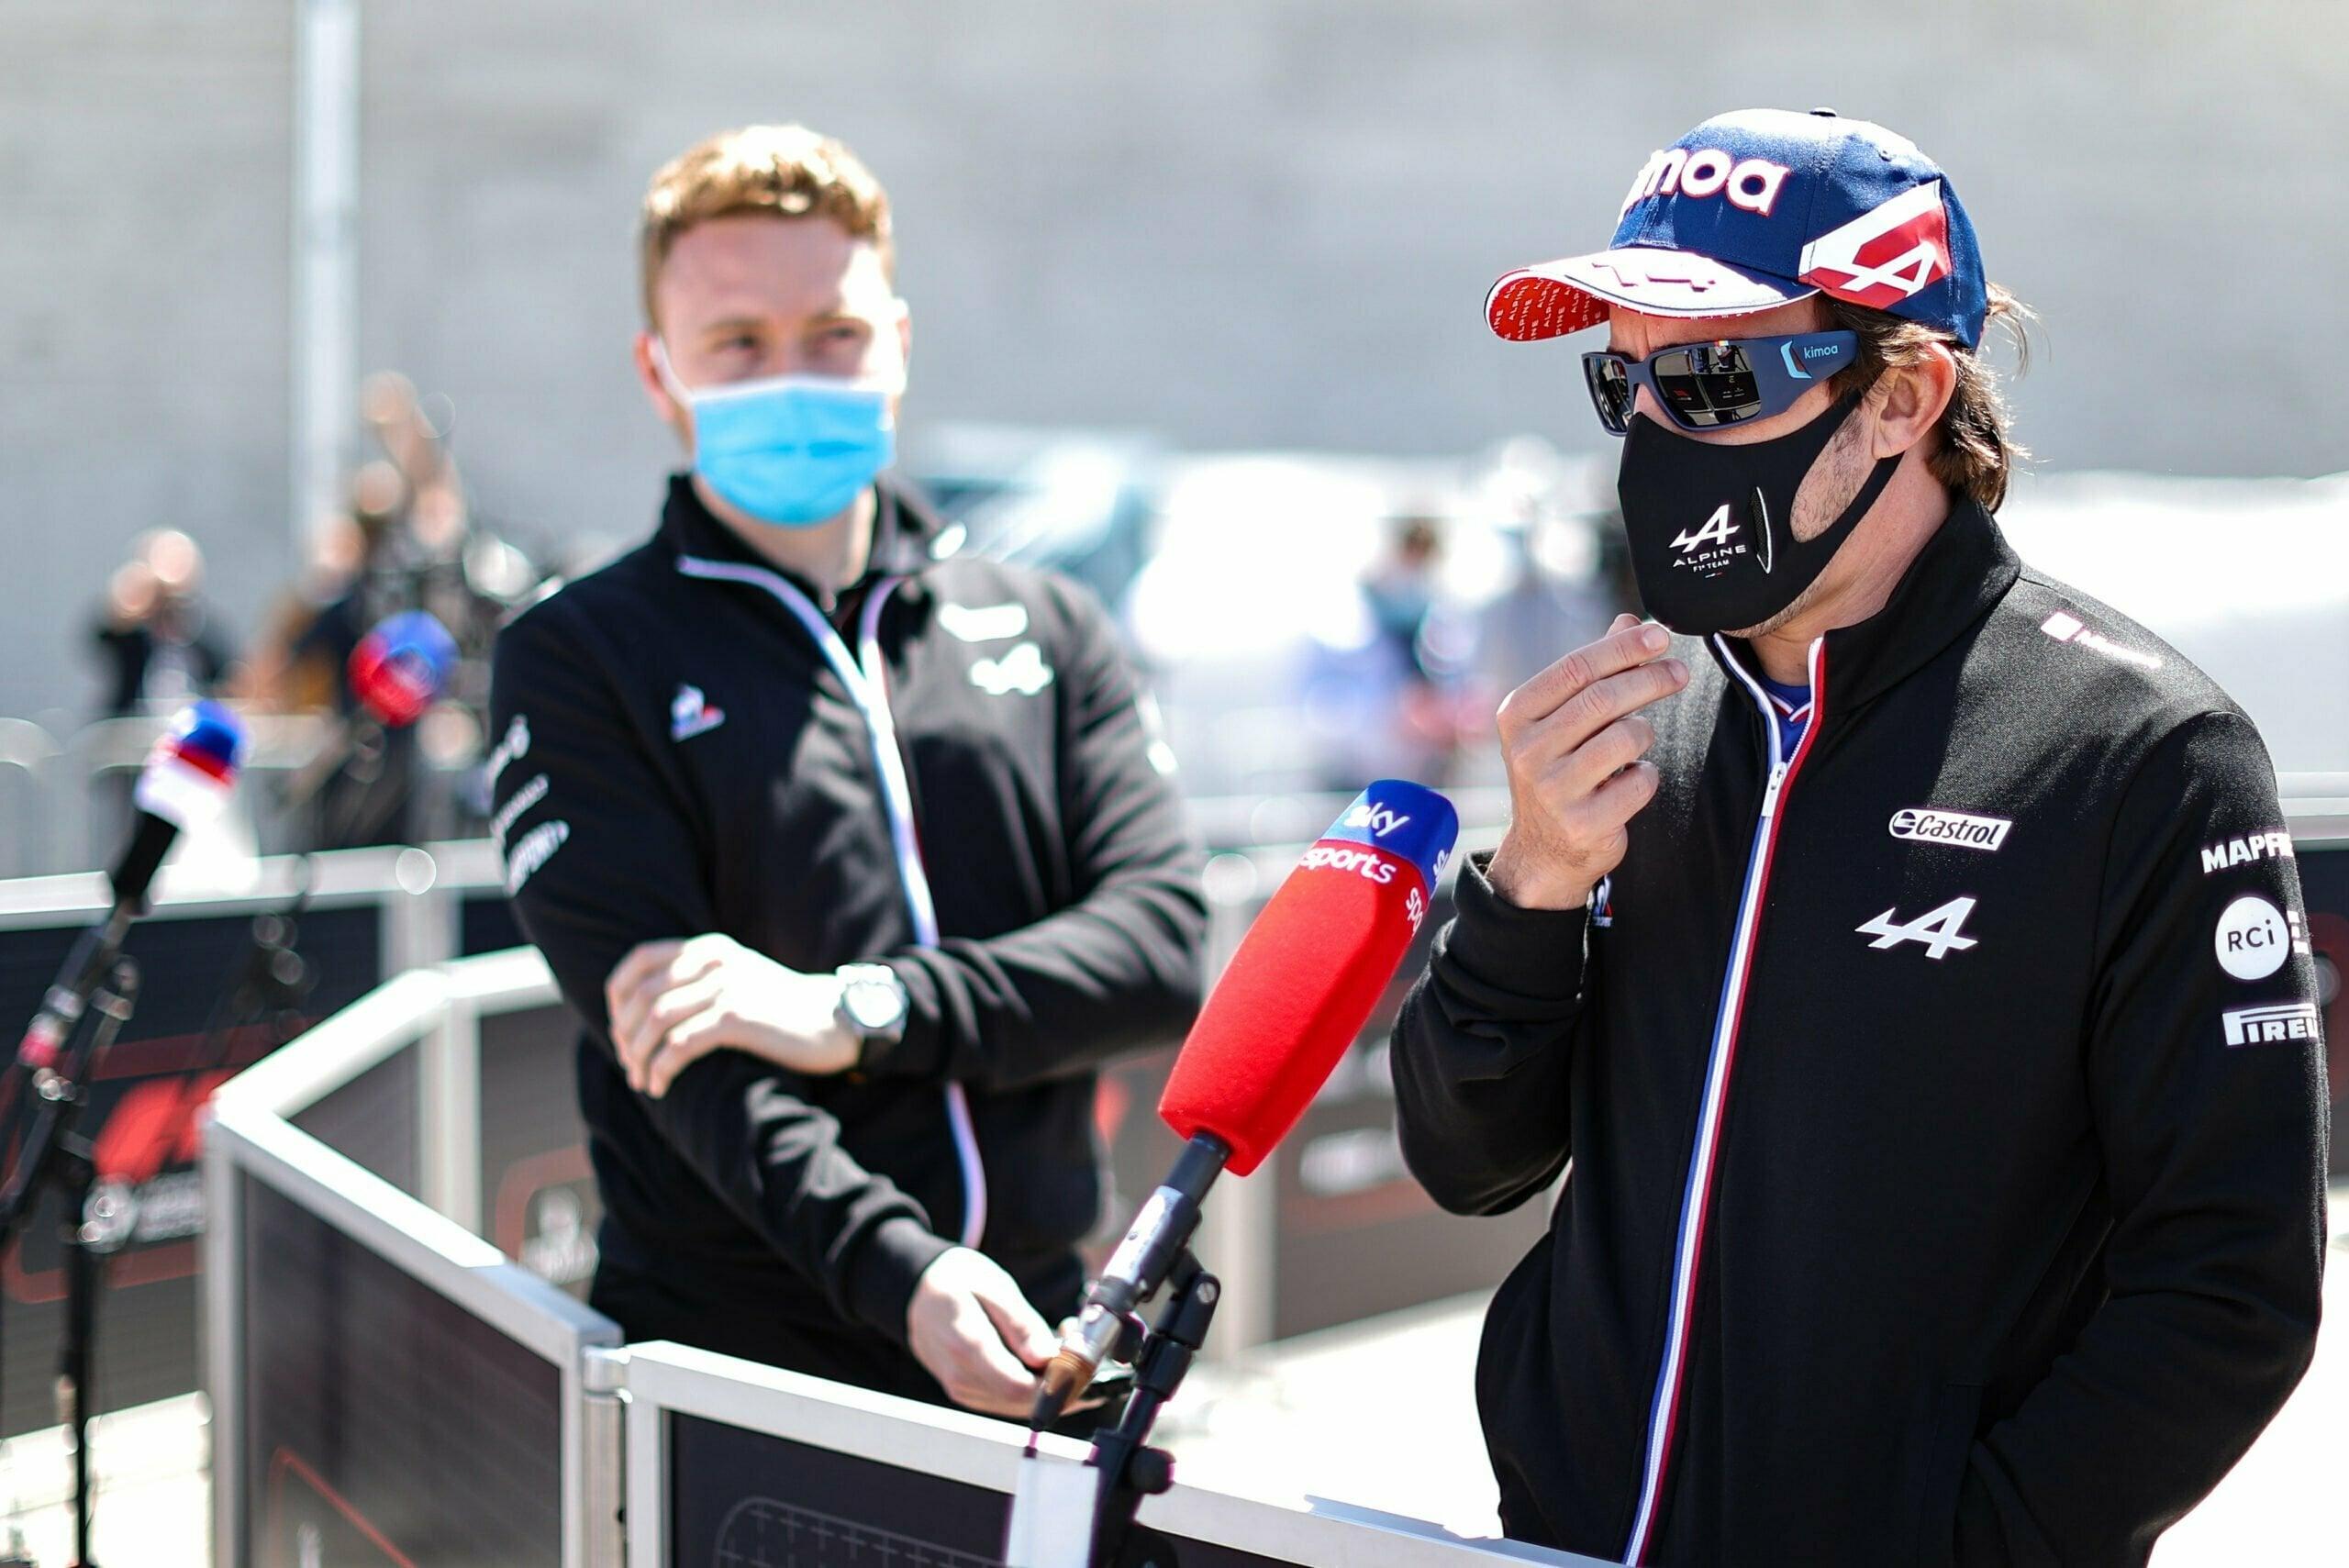 Alpine F1 Team : Grand Prix Heineken du Portugal de Formule 1 2021